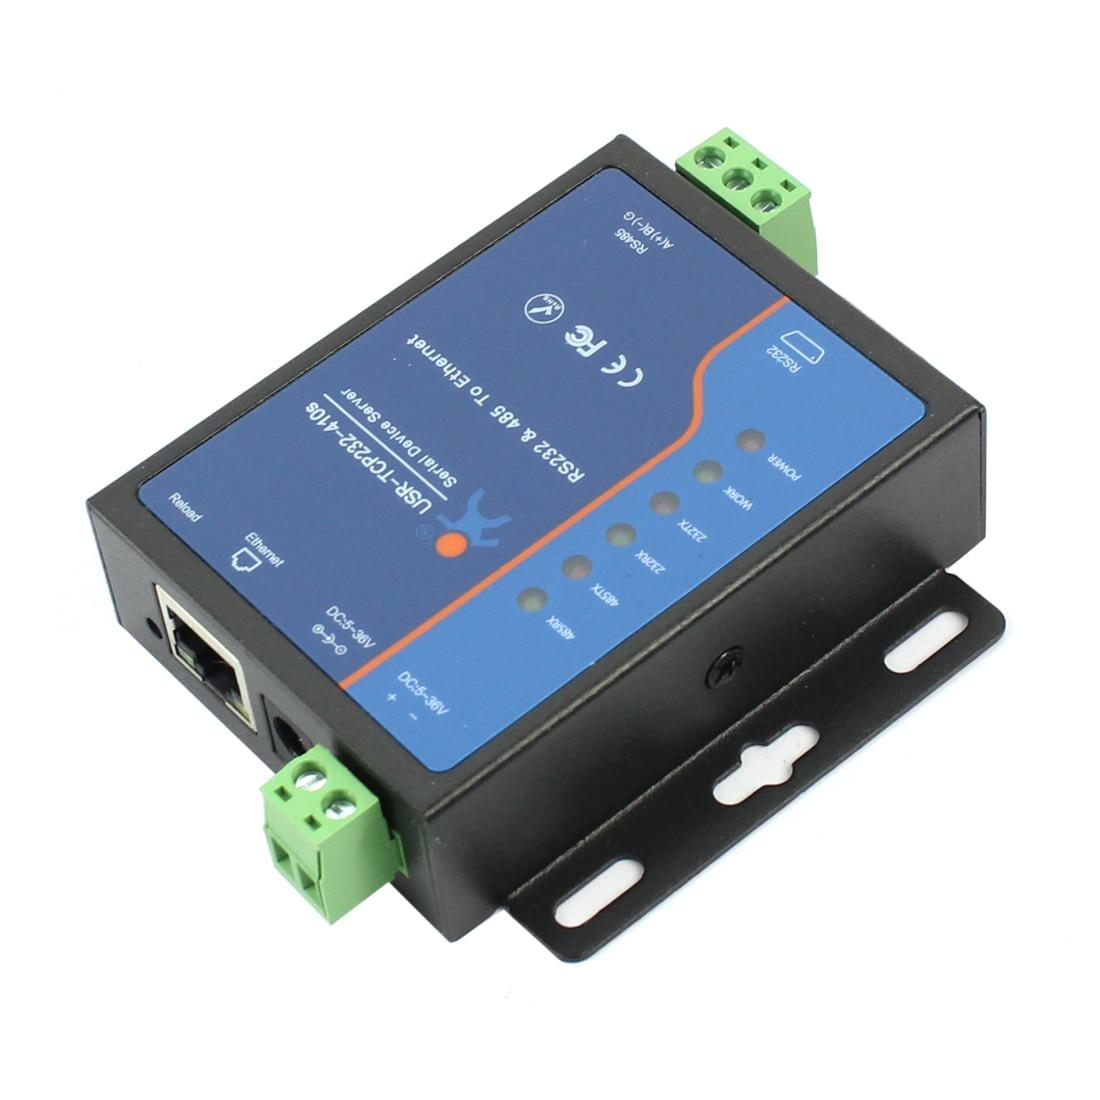 Q18039 USRIOT USR TCP232 410S terminali güç kaynağı RS232 RS485 tcp/ip dönüştürücü seri Ethernet seri aygıt sunucusu